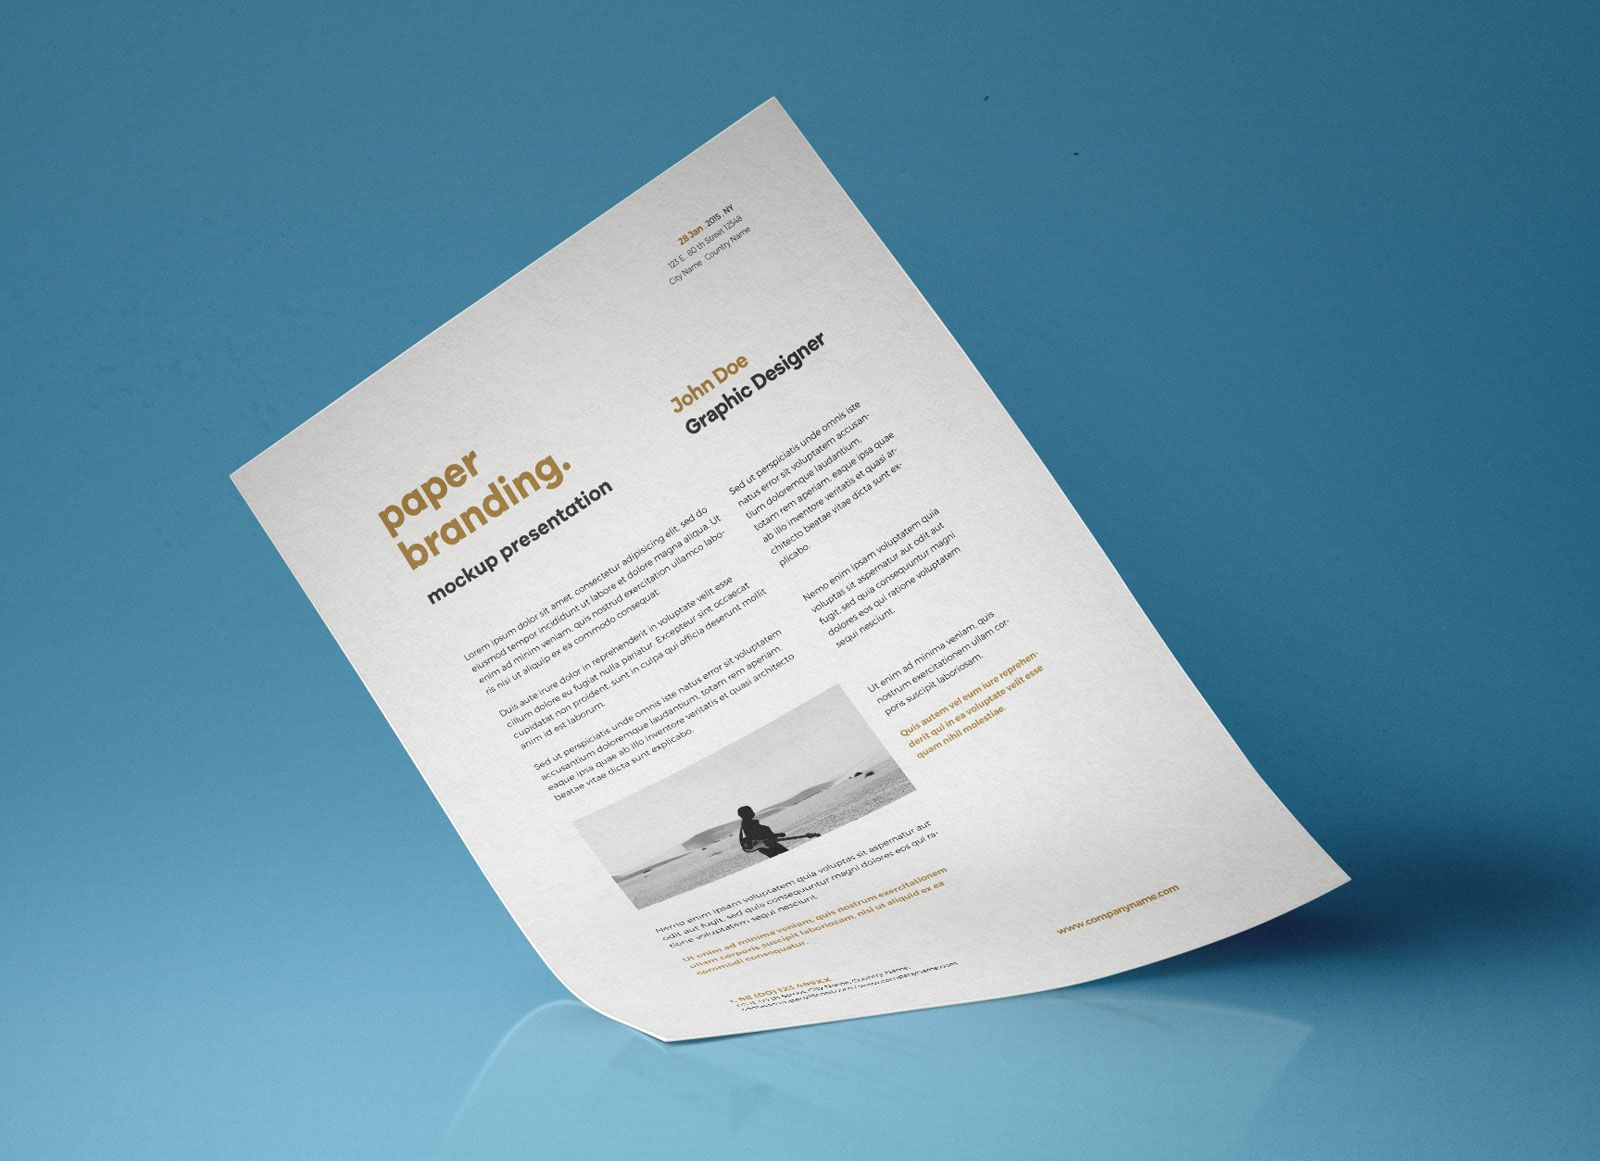 Free A4 Flyer Resume Paper Mockup PSD